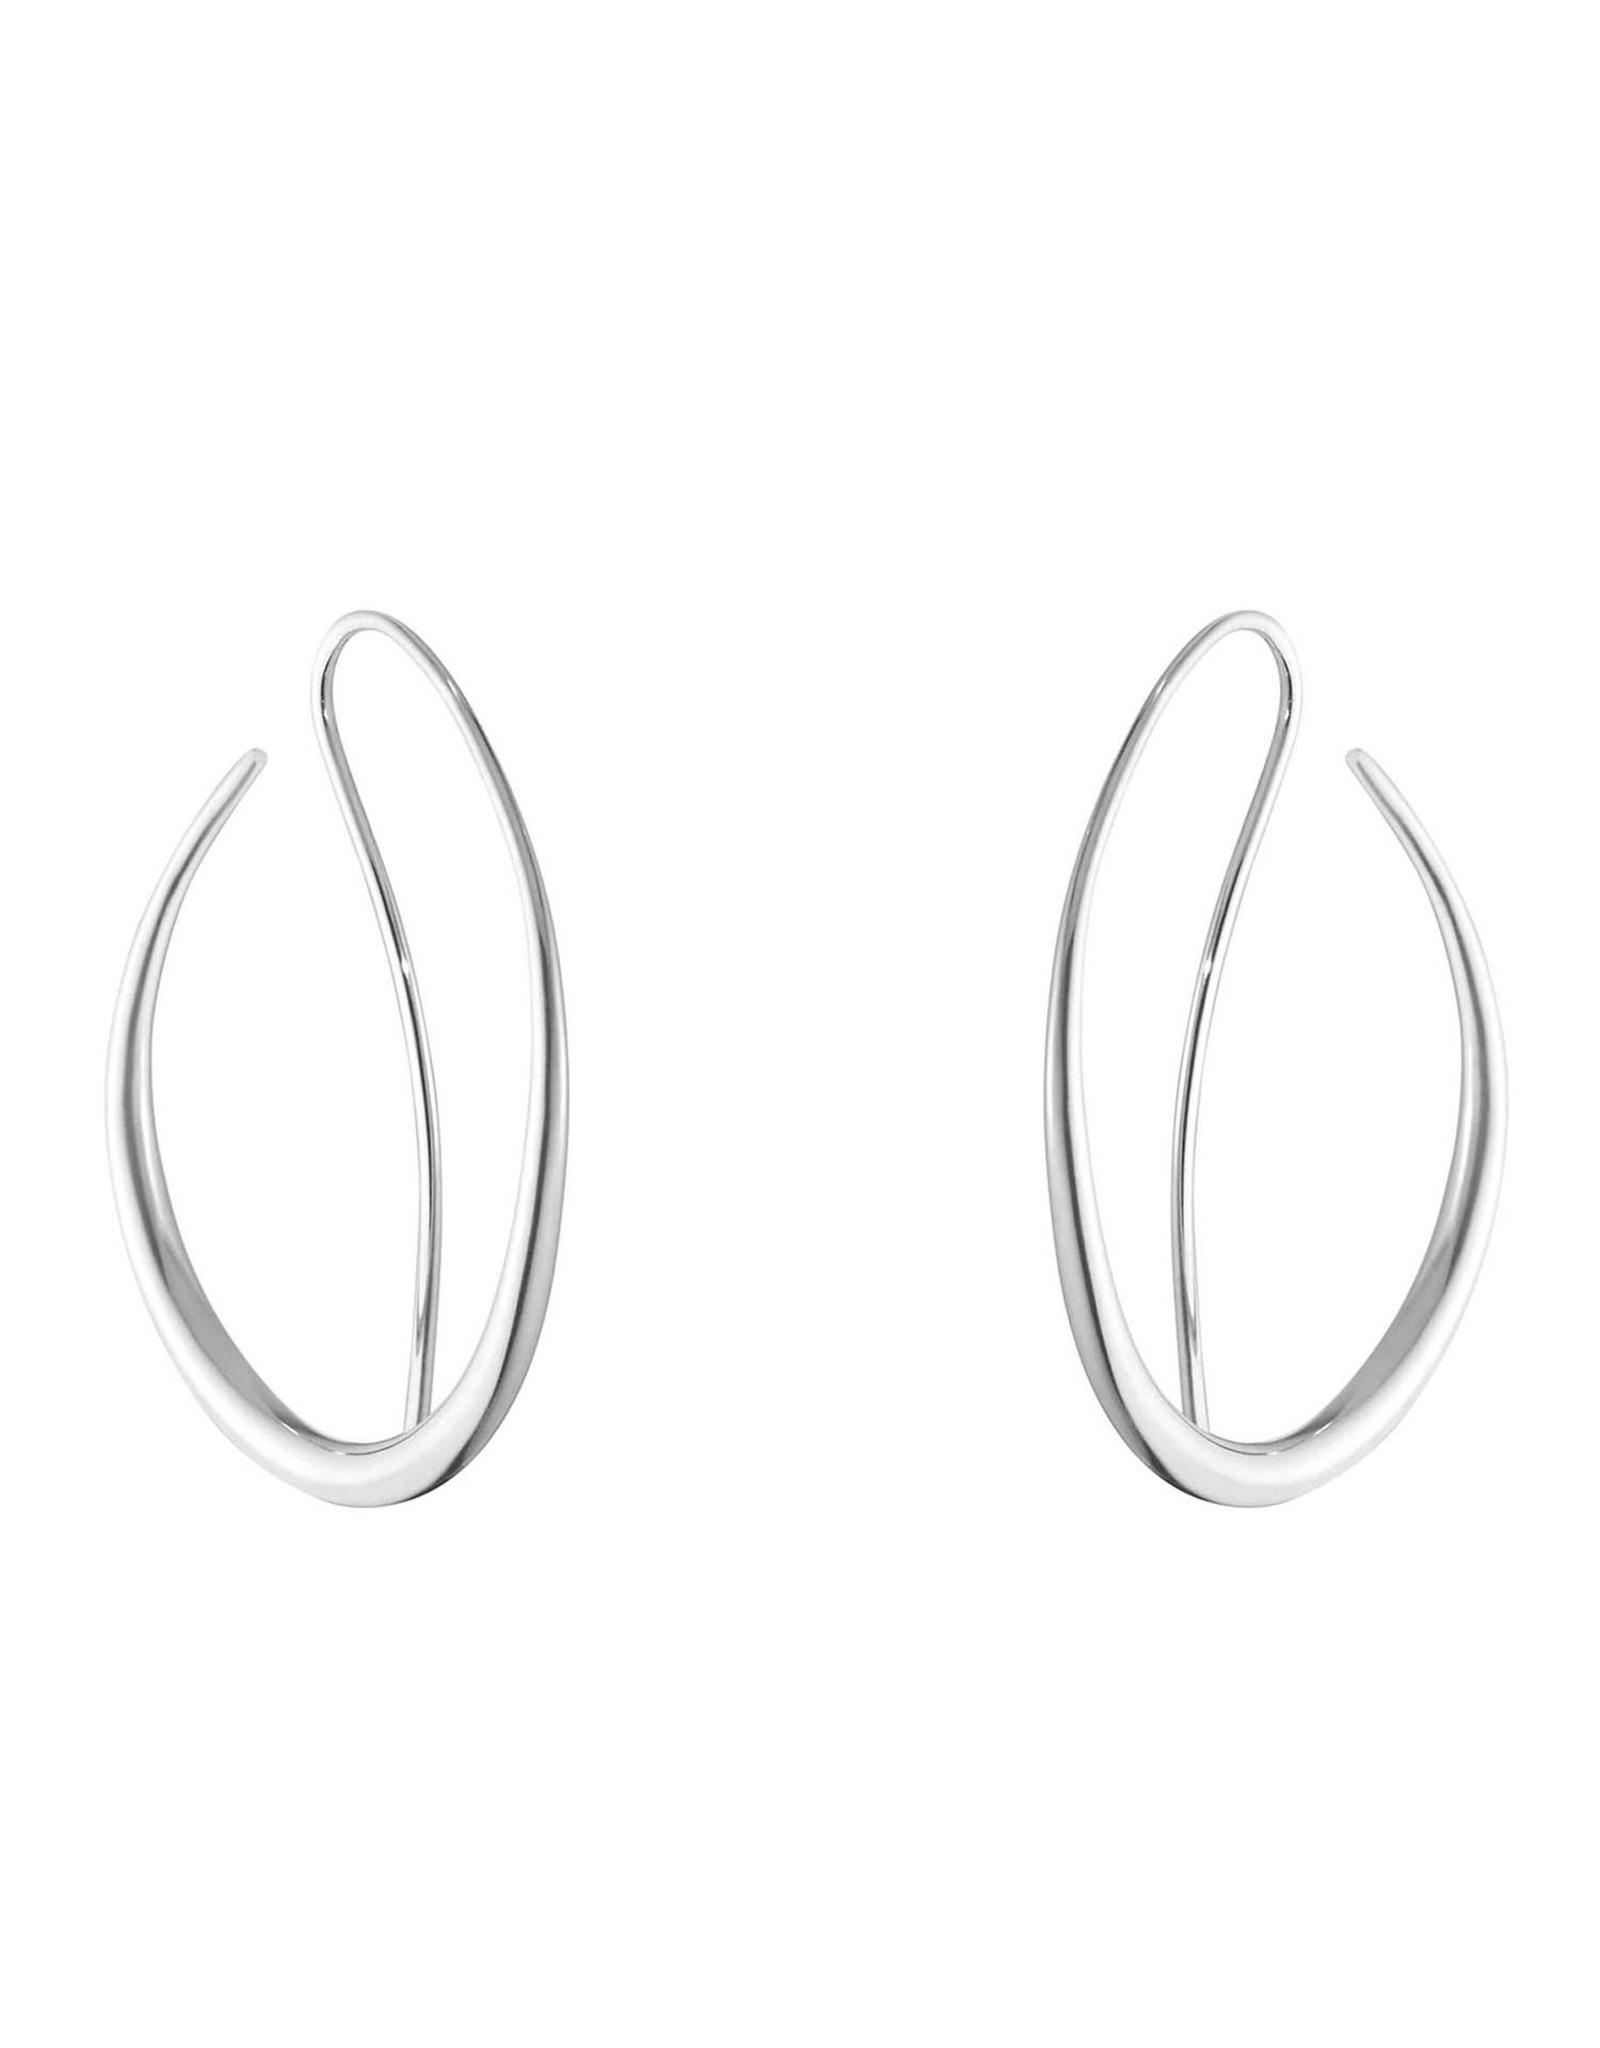 Georg Jensen Offspring Earring 433B, Silver